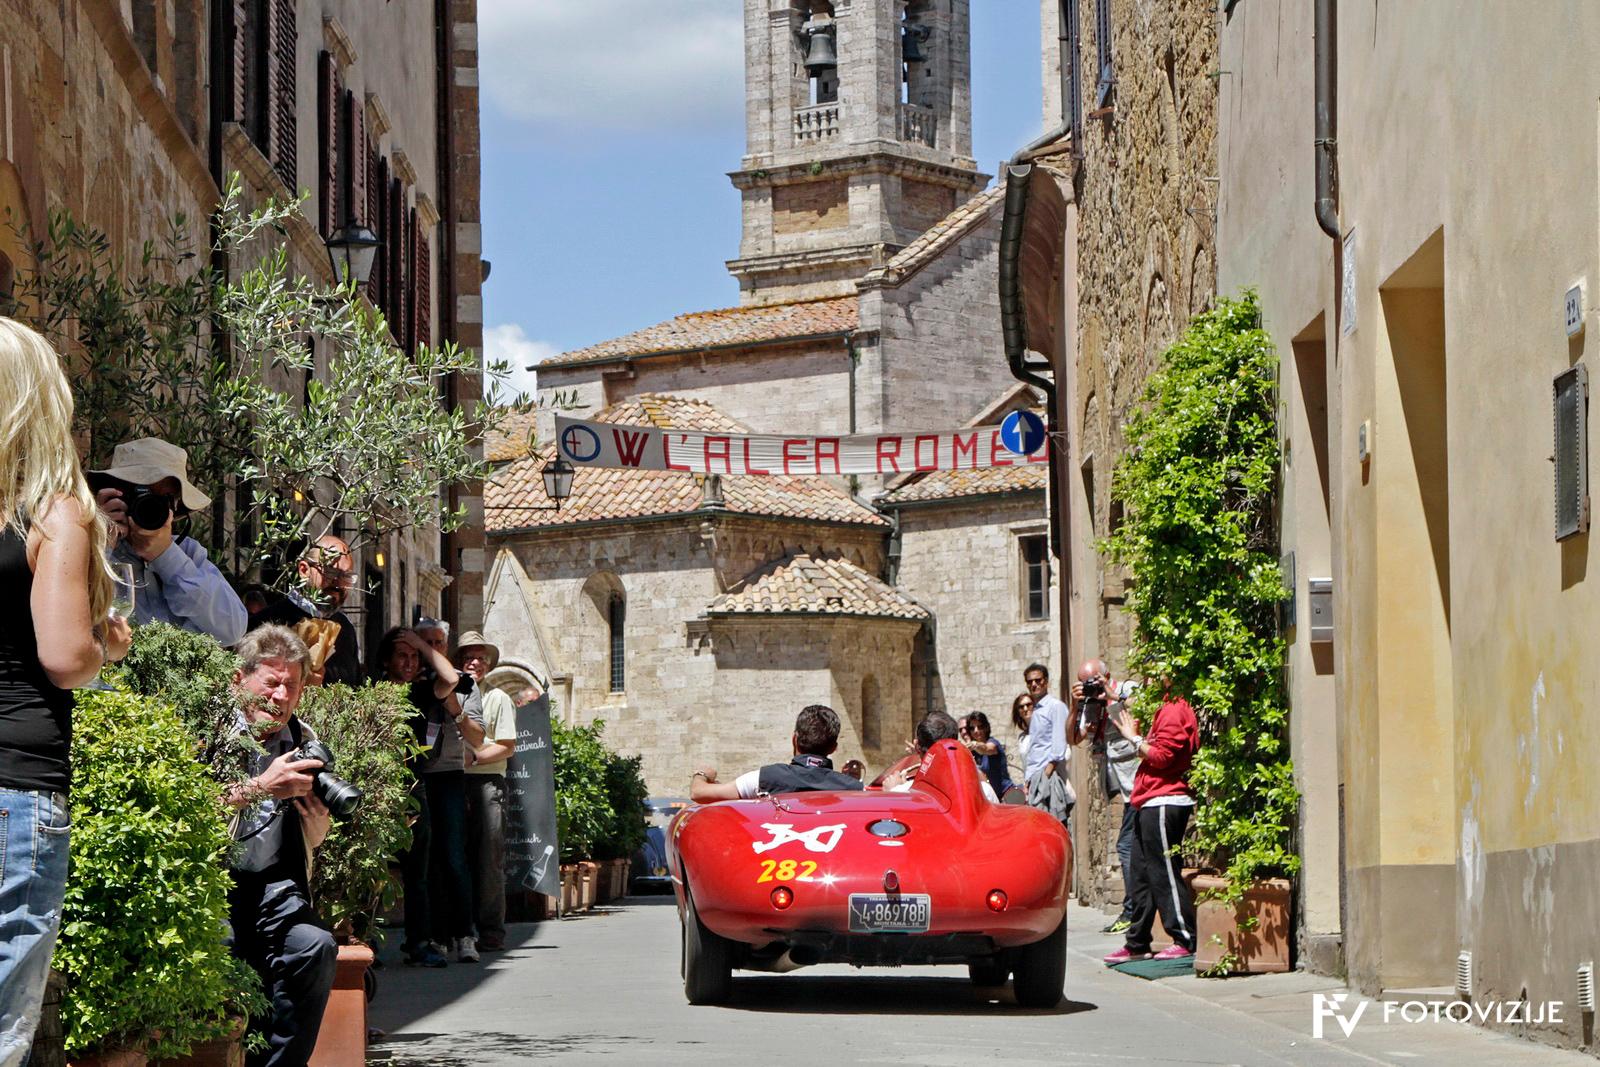 Mille Miglia 2018: Max Girrardo v ferrariju 550 mondial spider Scaglietti pod napisom, ki že tradicionalno pozdravlja alfe